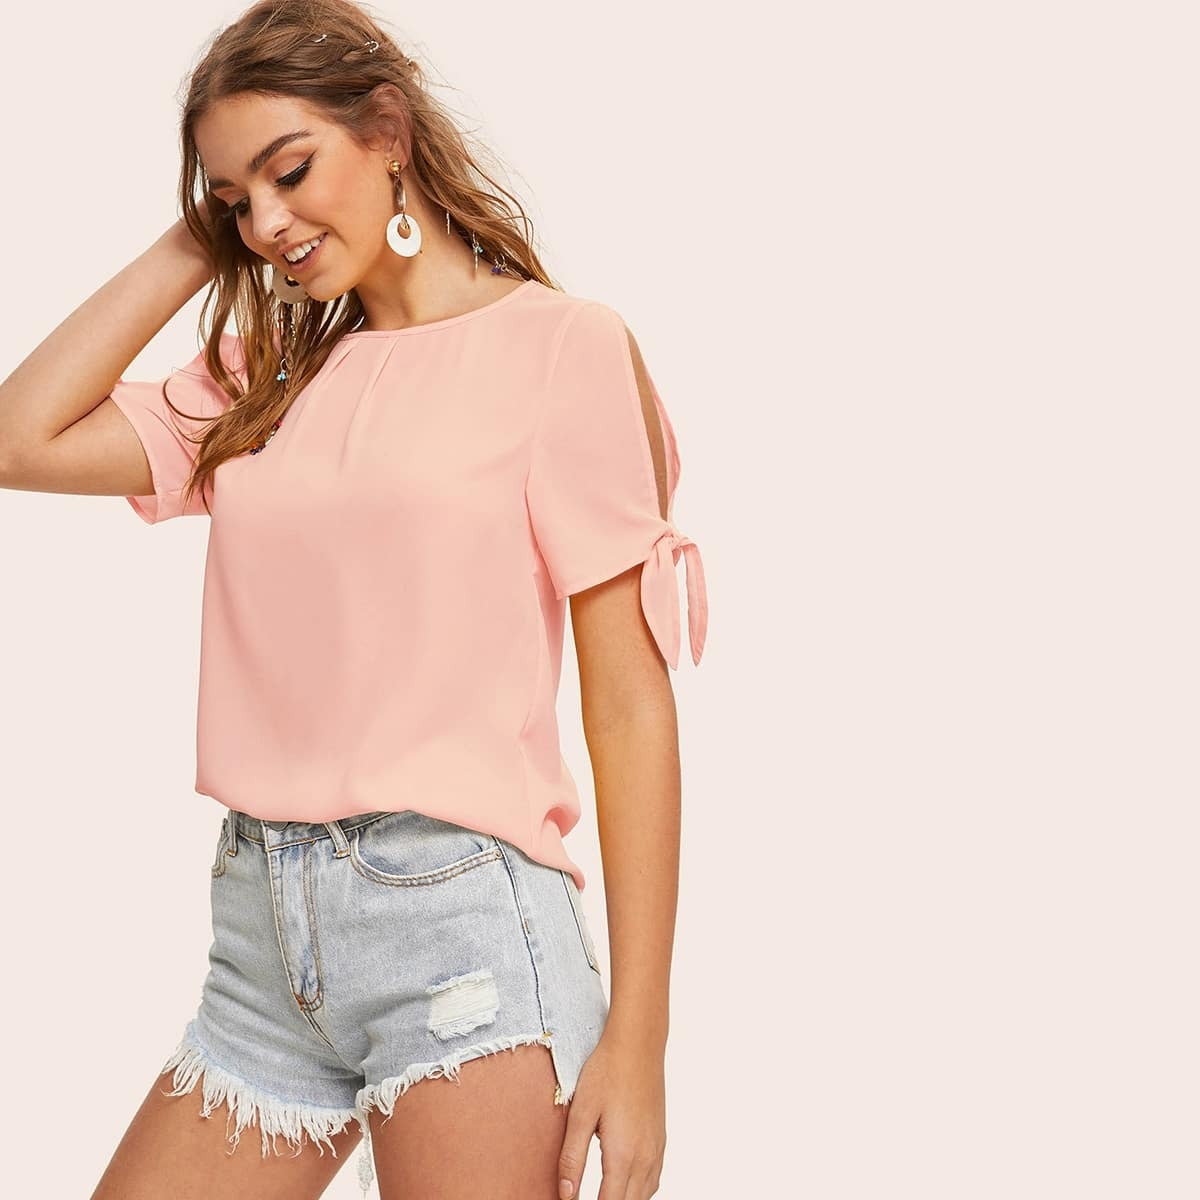 Розовая Блуза С Широкими Завязками На Рукавах SheIn swblouse07190722235